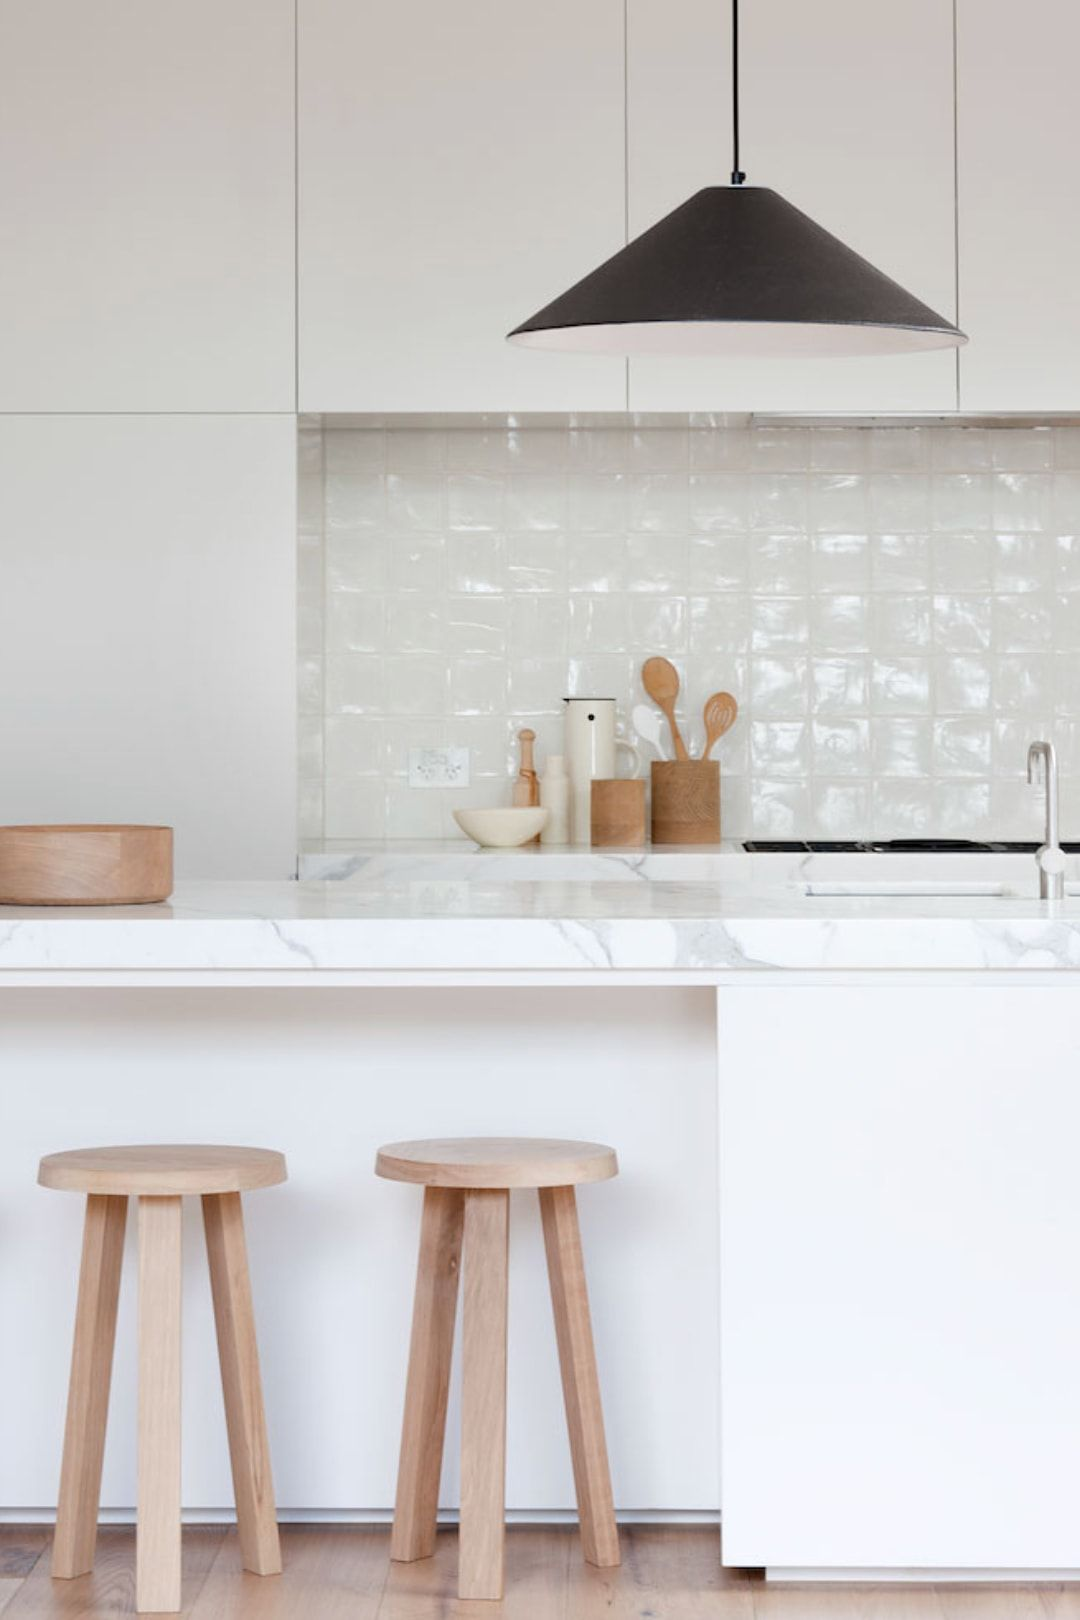 4 Minimalist Decorating Ideas from Australian Designers in 4